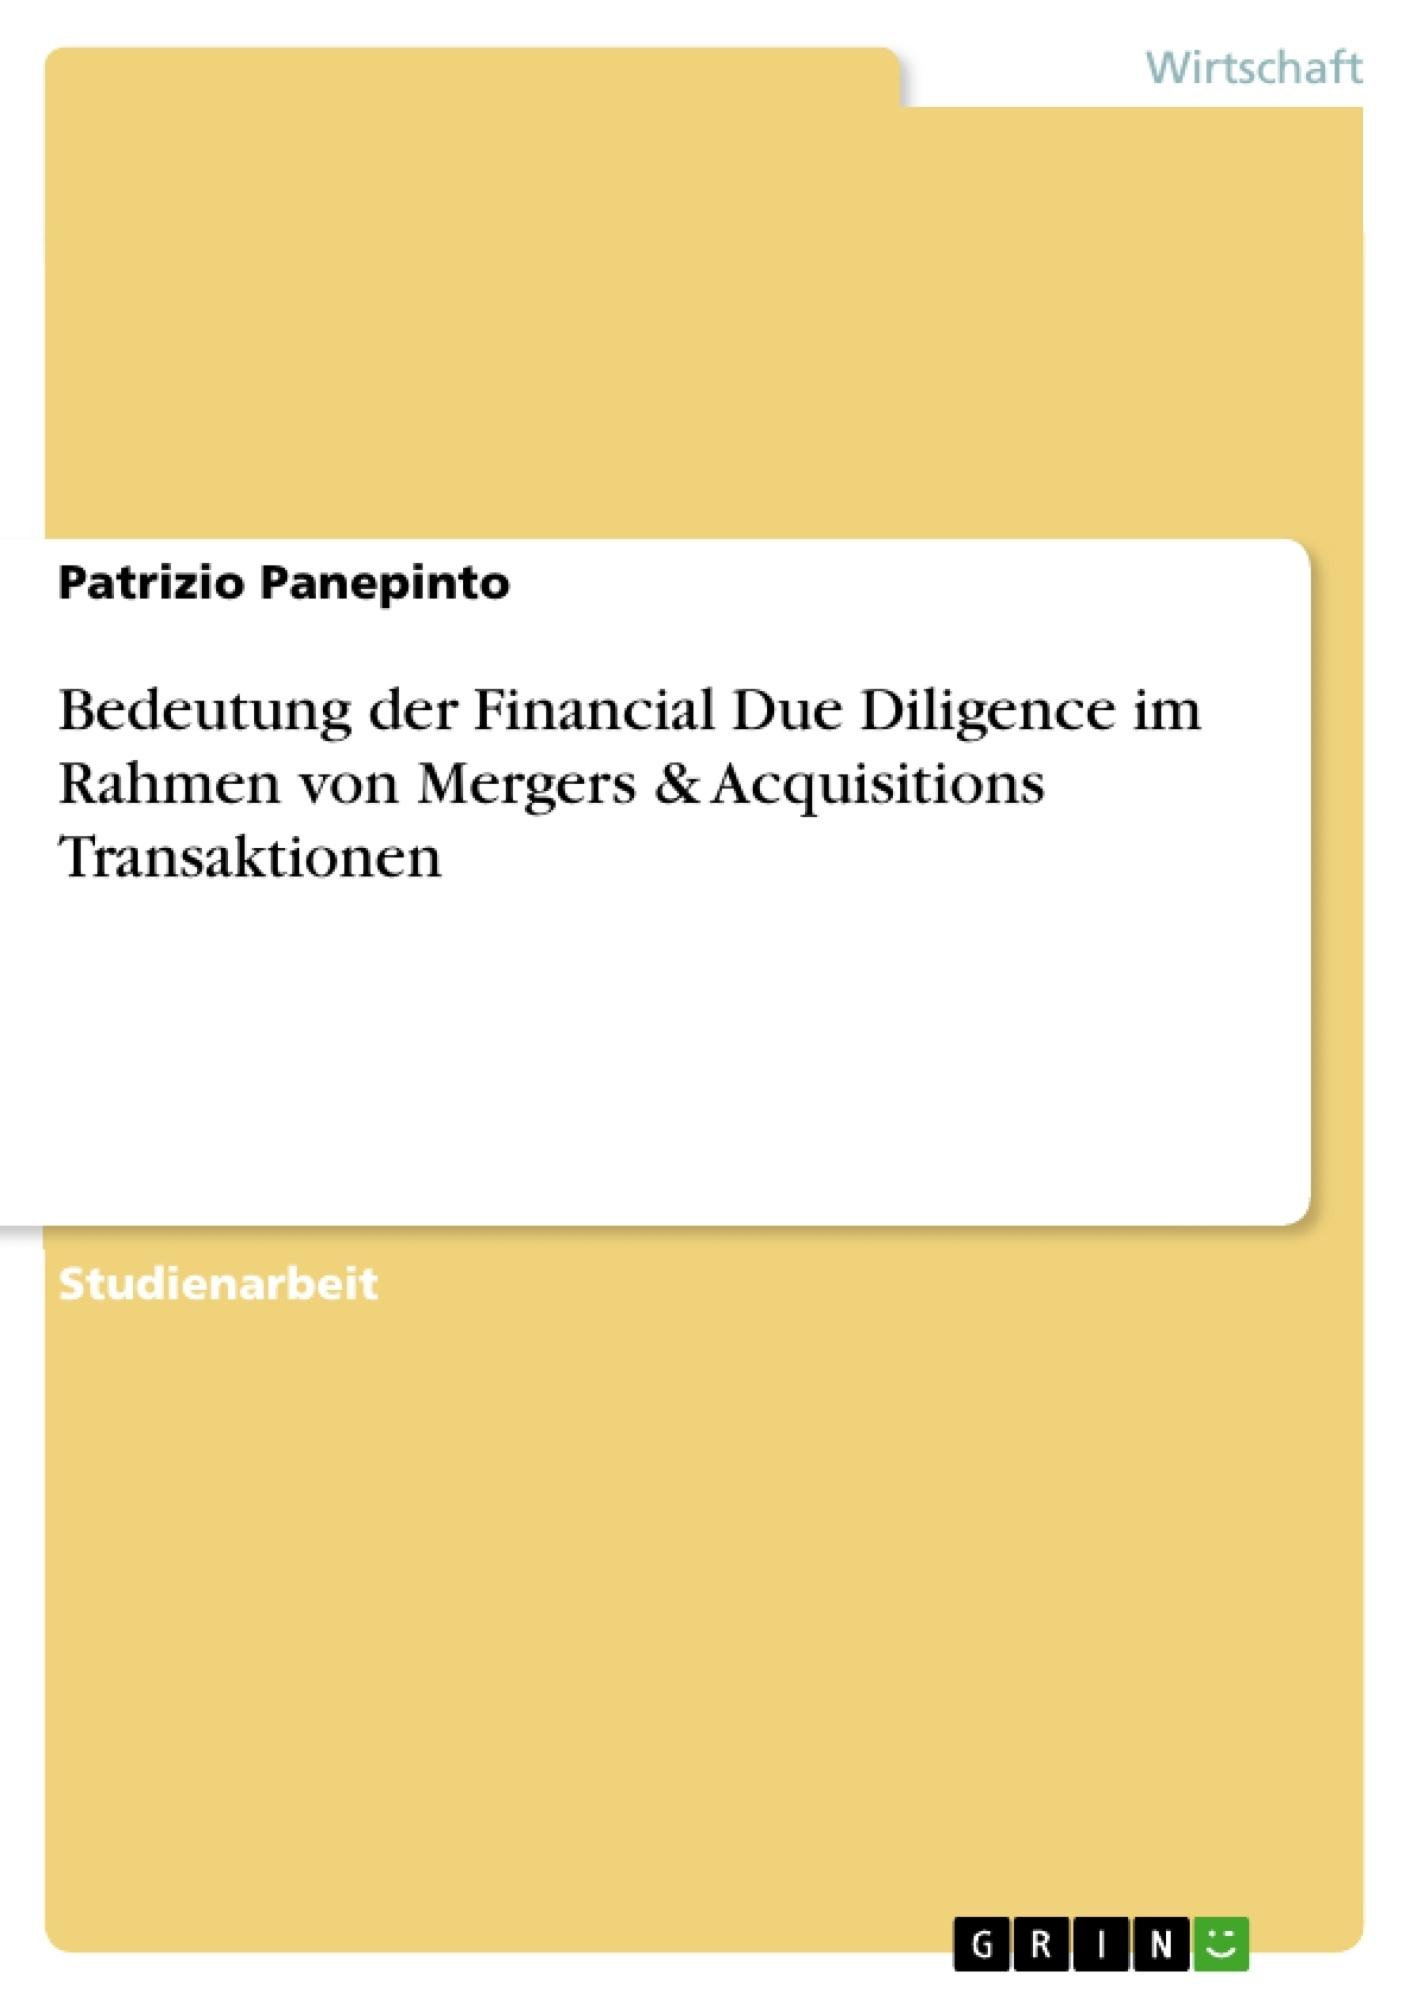 Titel: Bedeutung der Financial Due Diligence im Rahmen von Mergers & Acquisitions Transaktionen